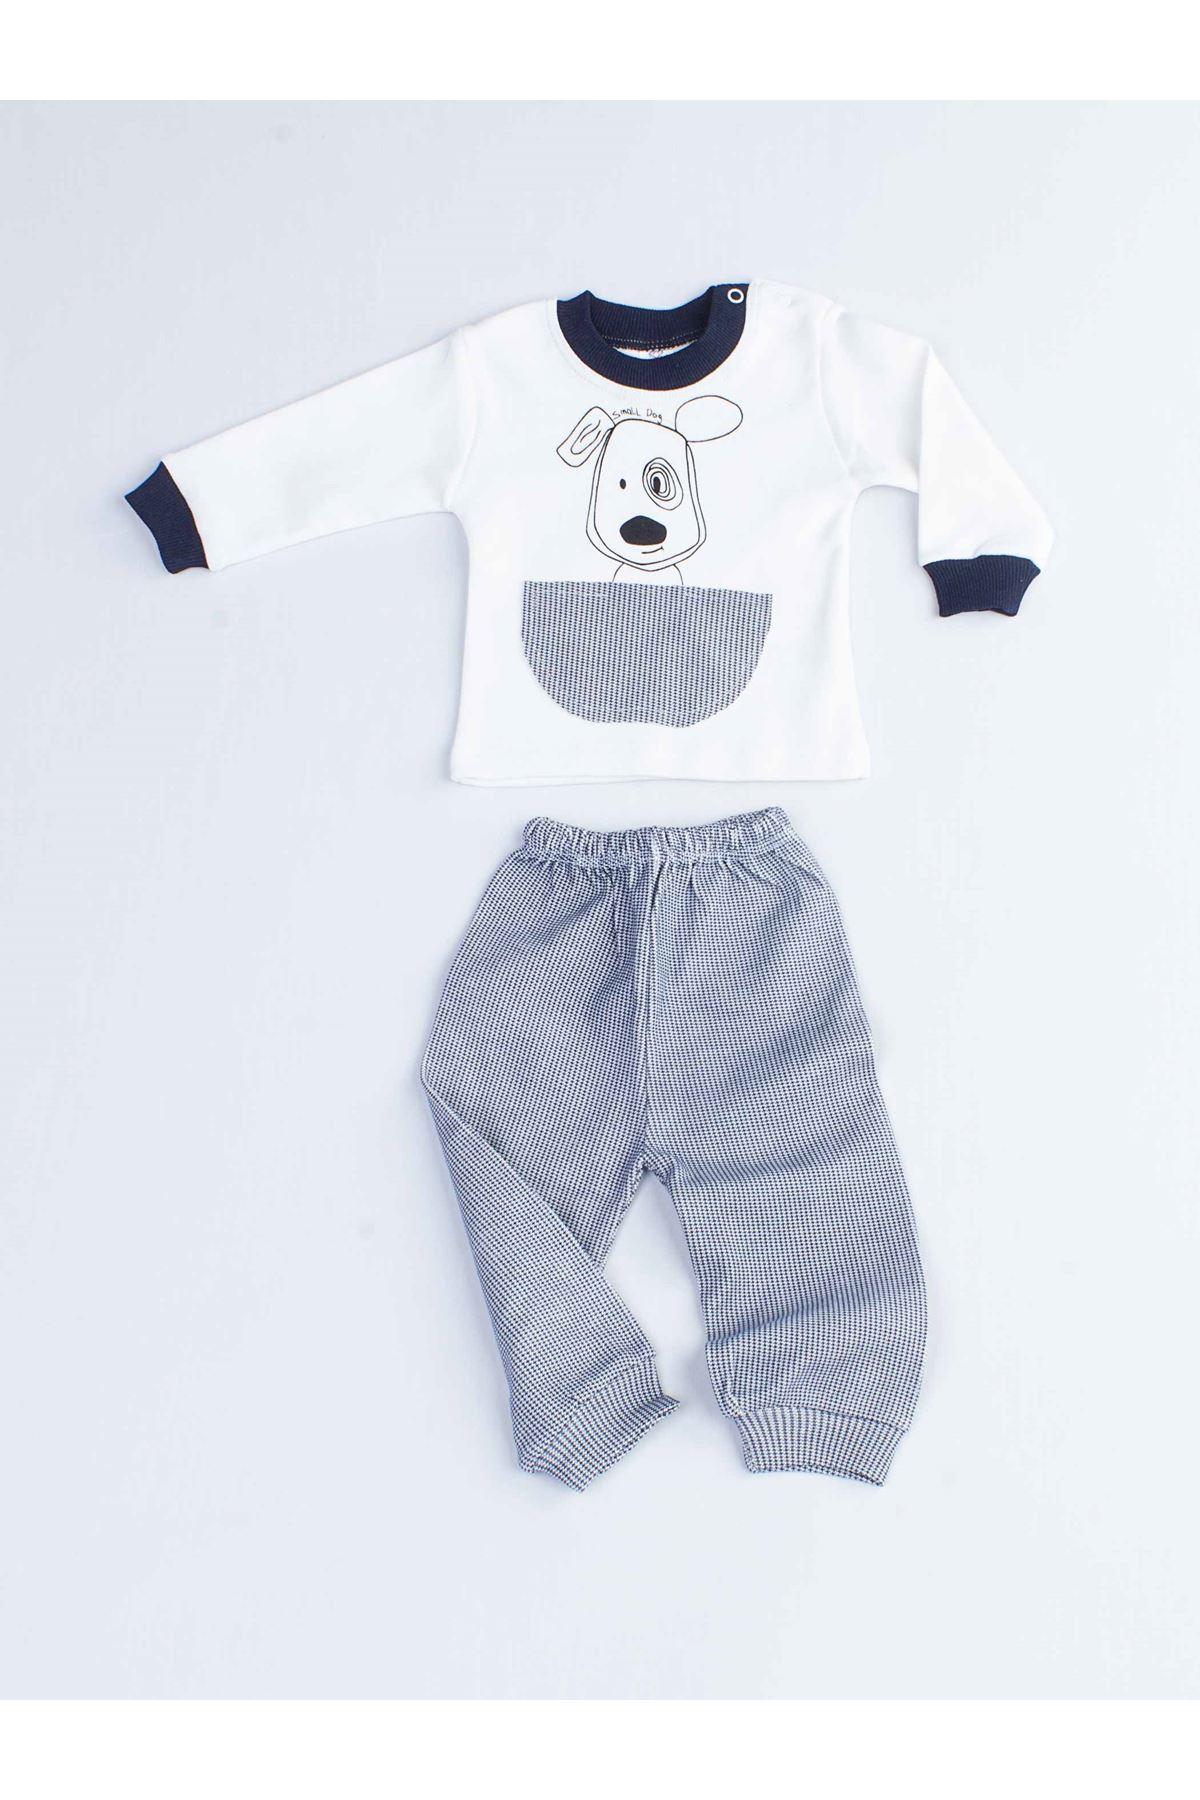 Navy Dog Male Baby Pajamas set